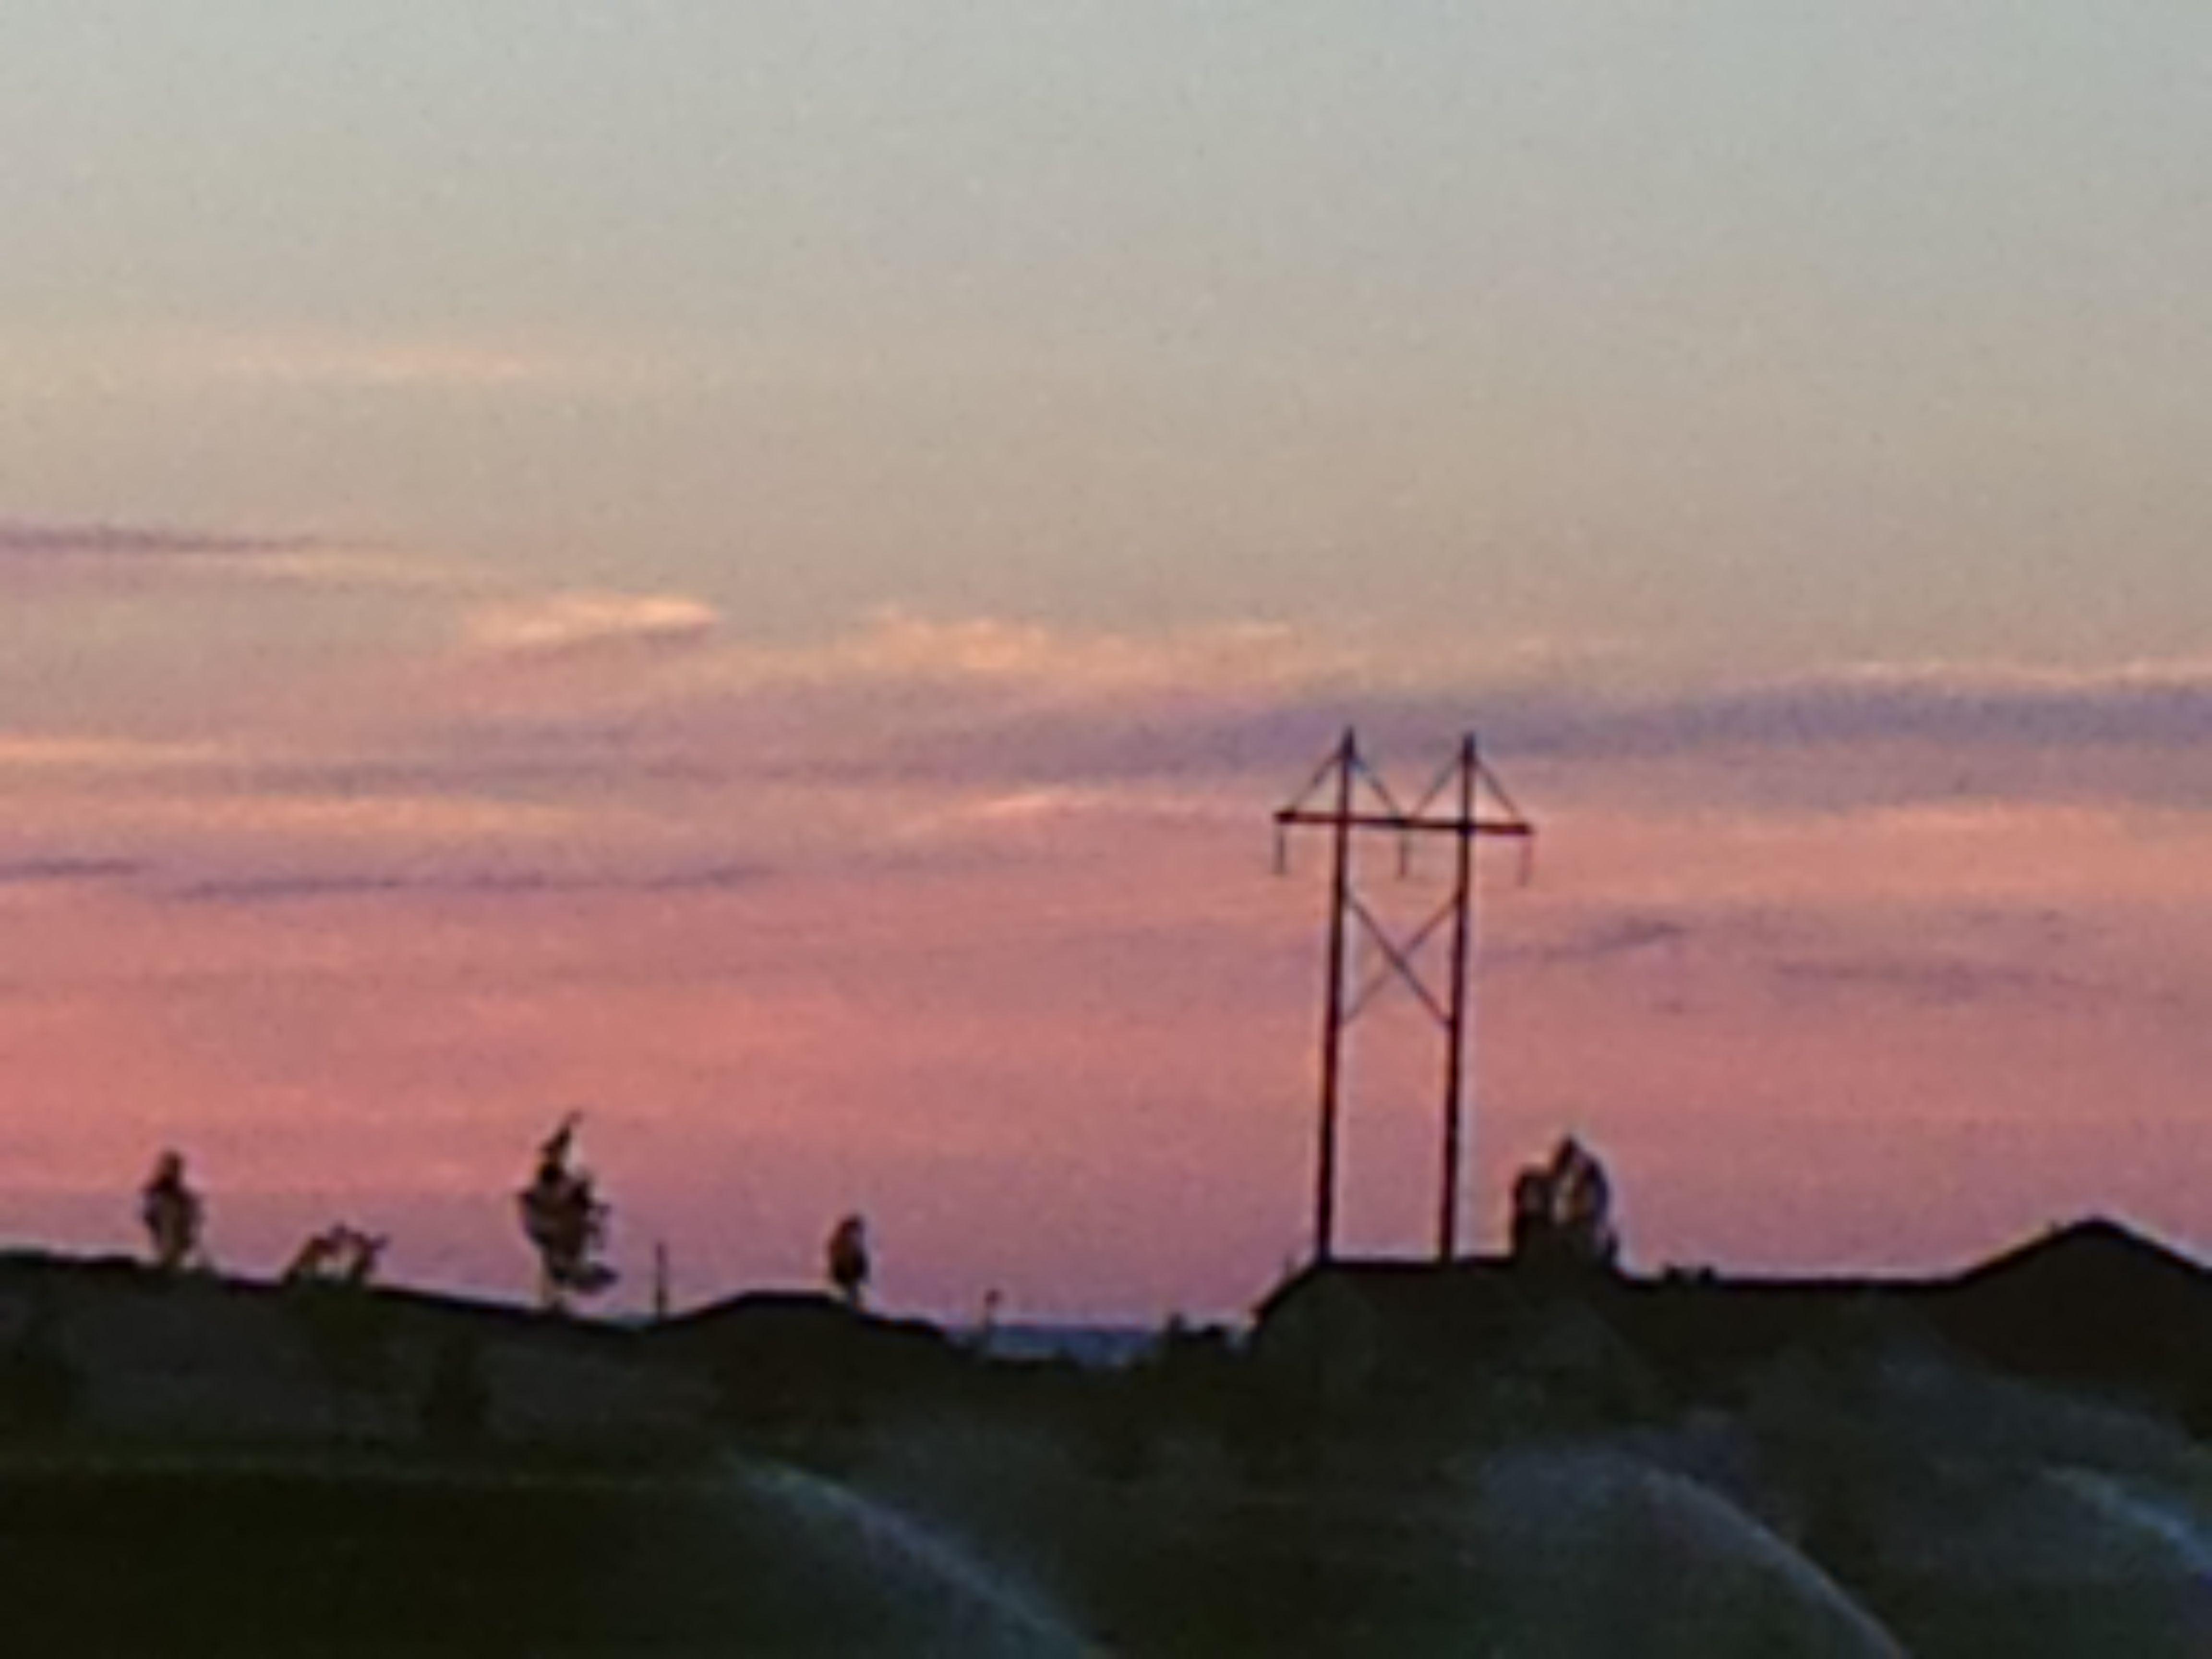 PT 29 NAMPA IDAHO. JUNE 15 SUNSET OVER A GOLF COURSE.